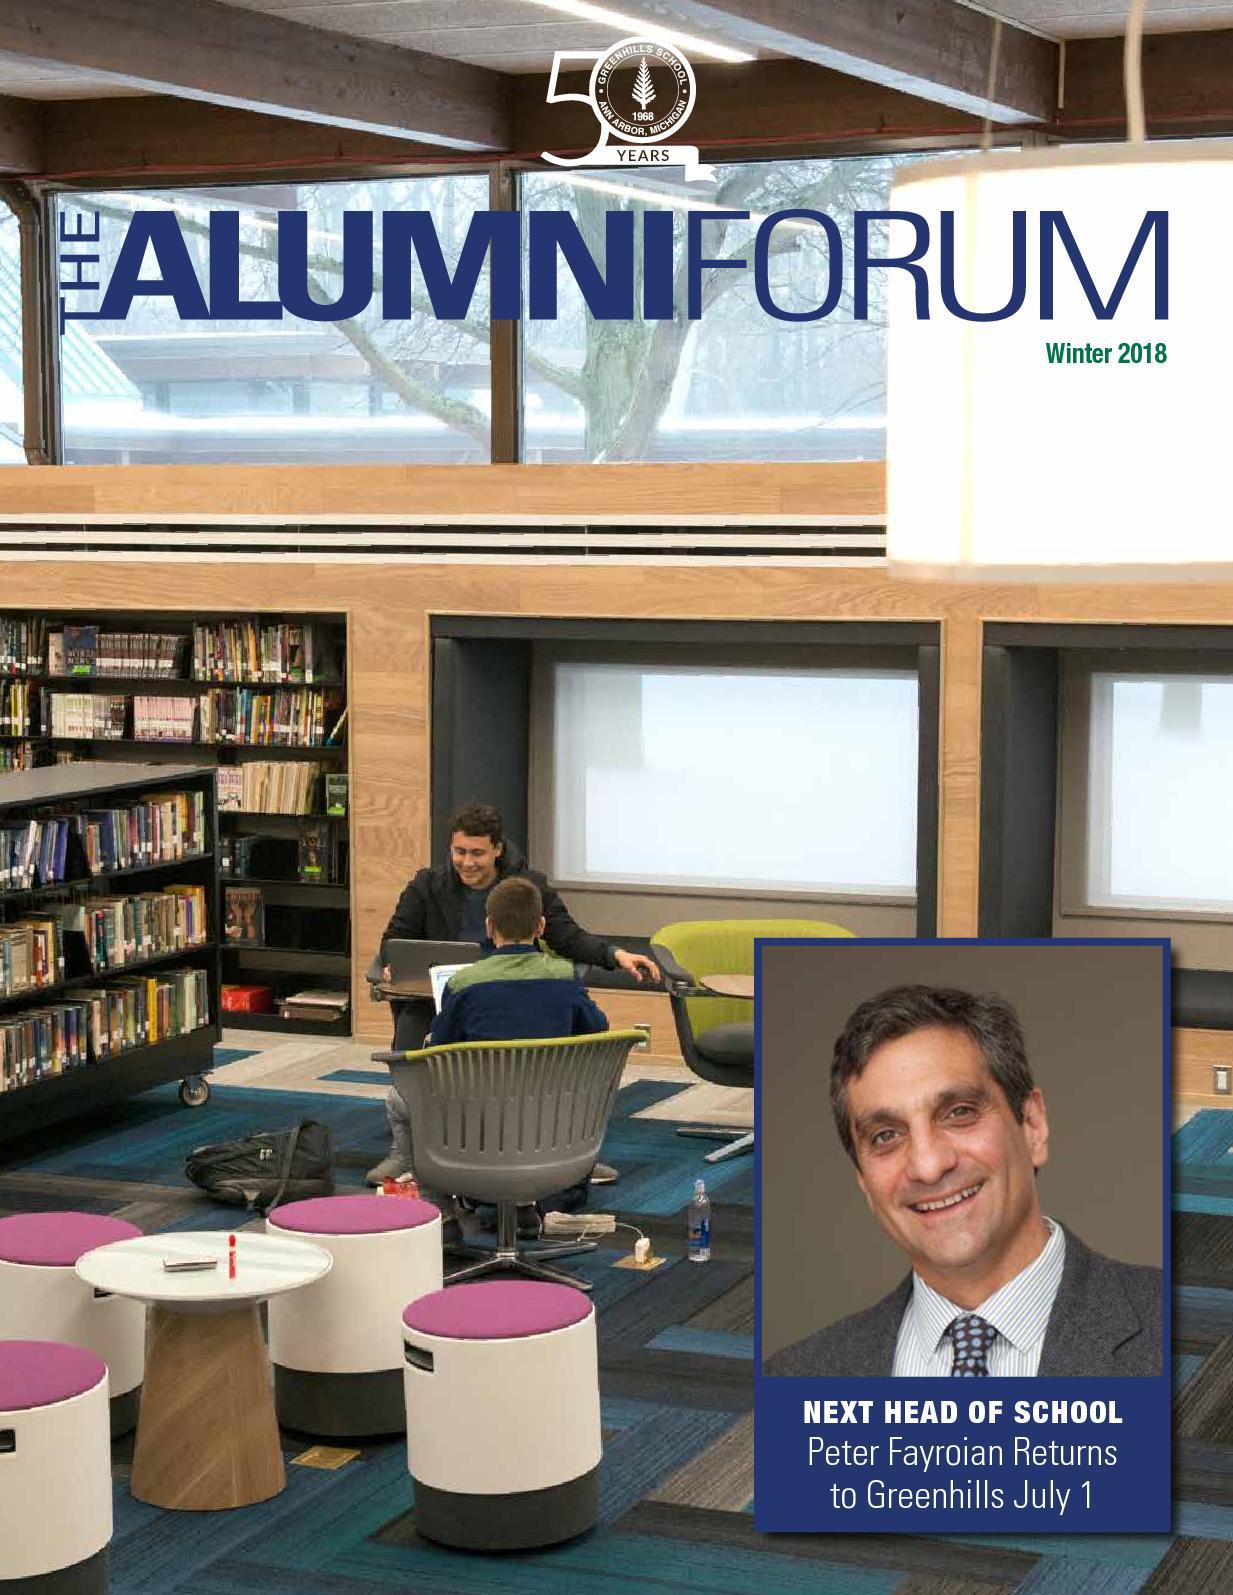 Calaméo - Alumni Forum Winter 2018